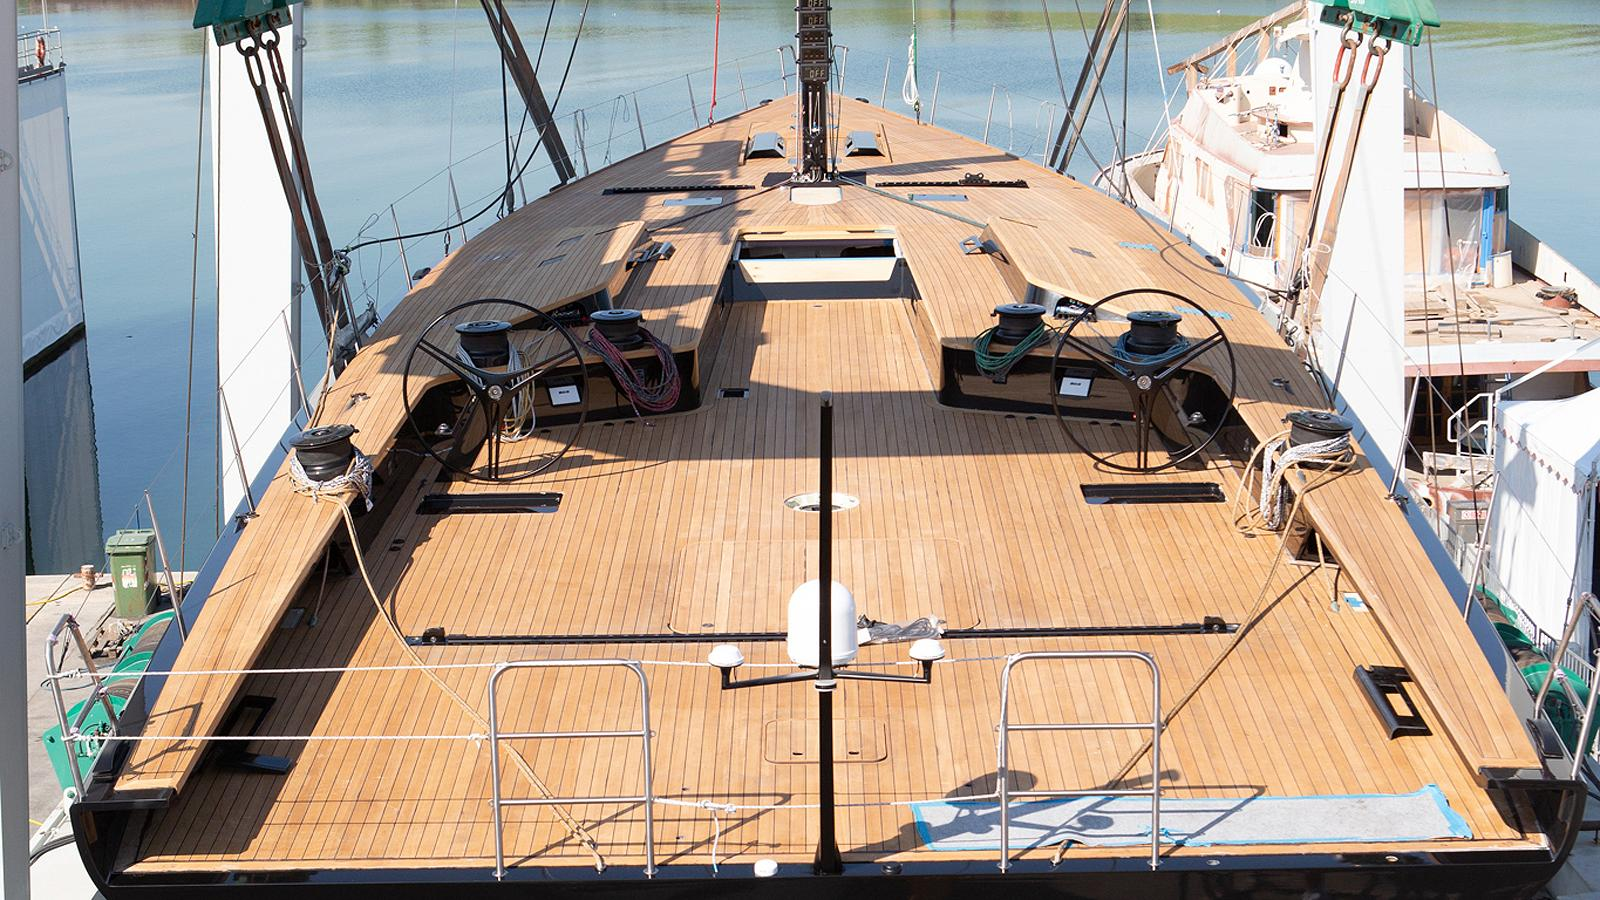 nahita wally 93 sailing yacht 2018 28m launch deck